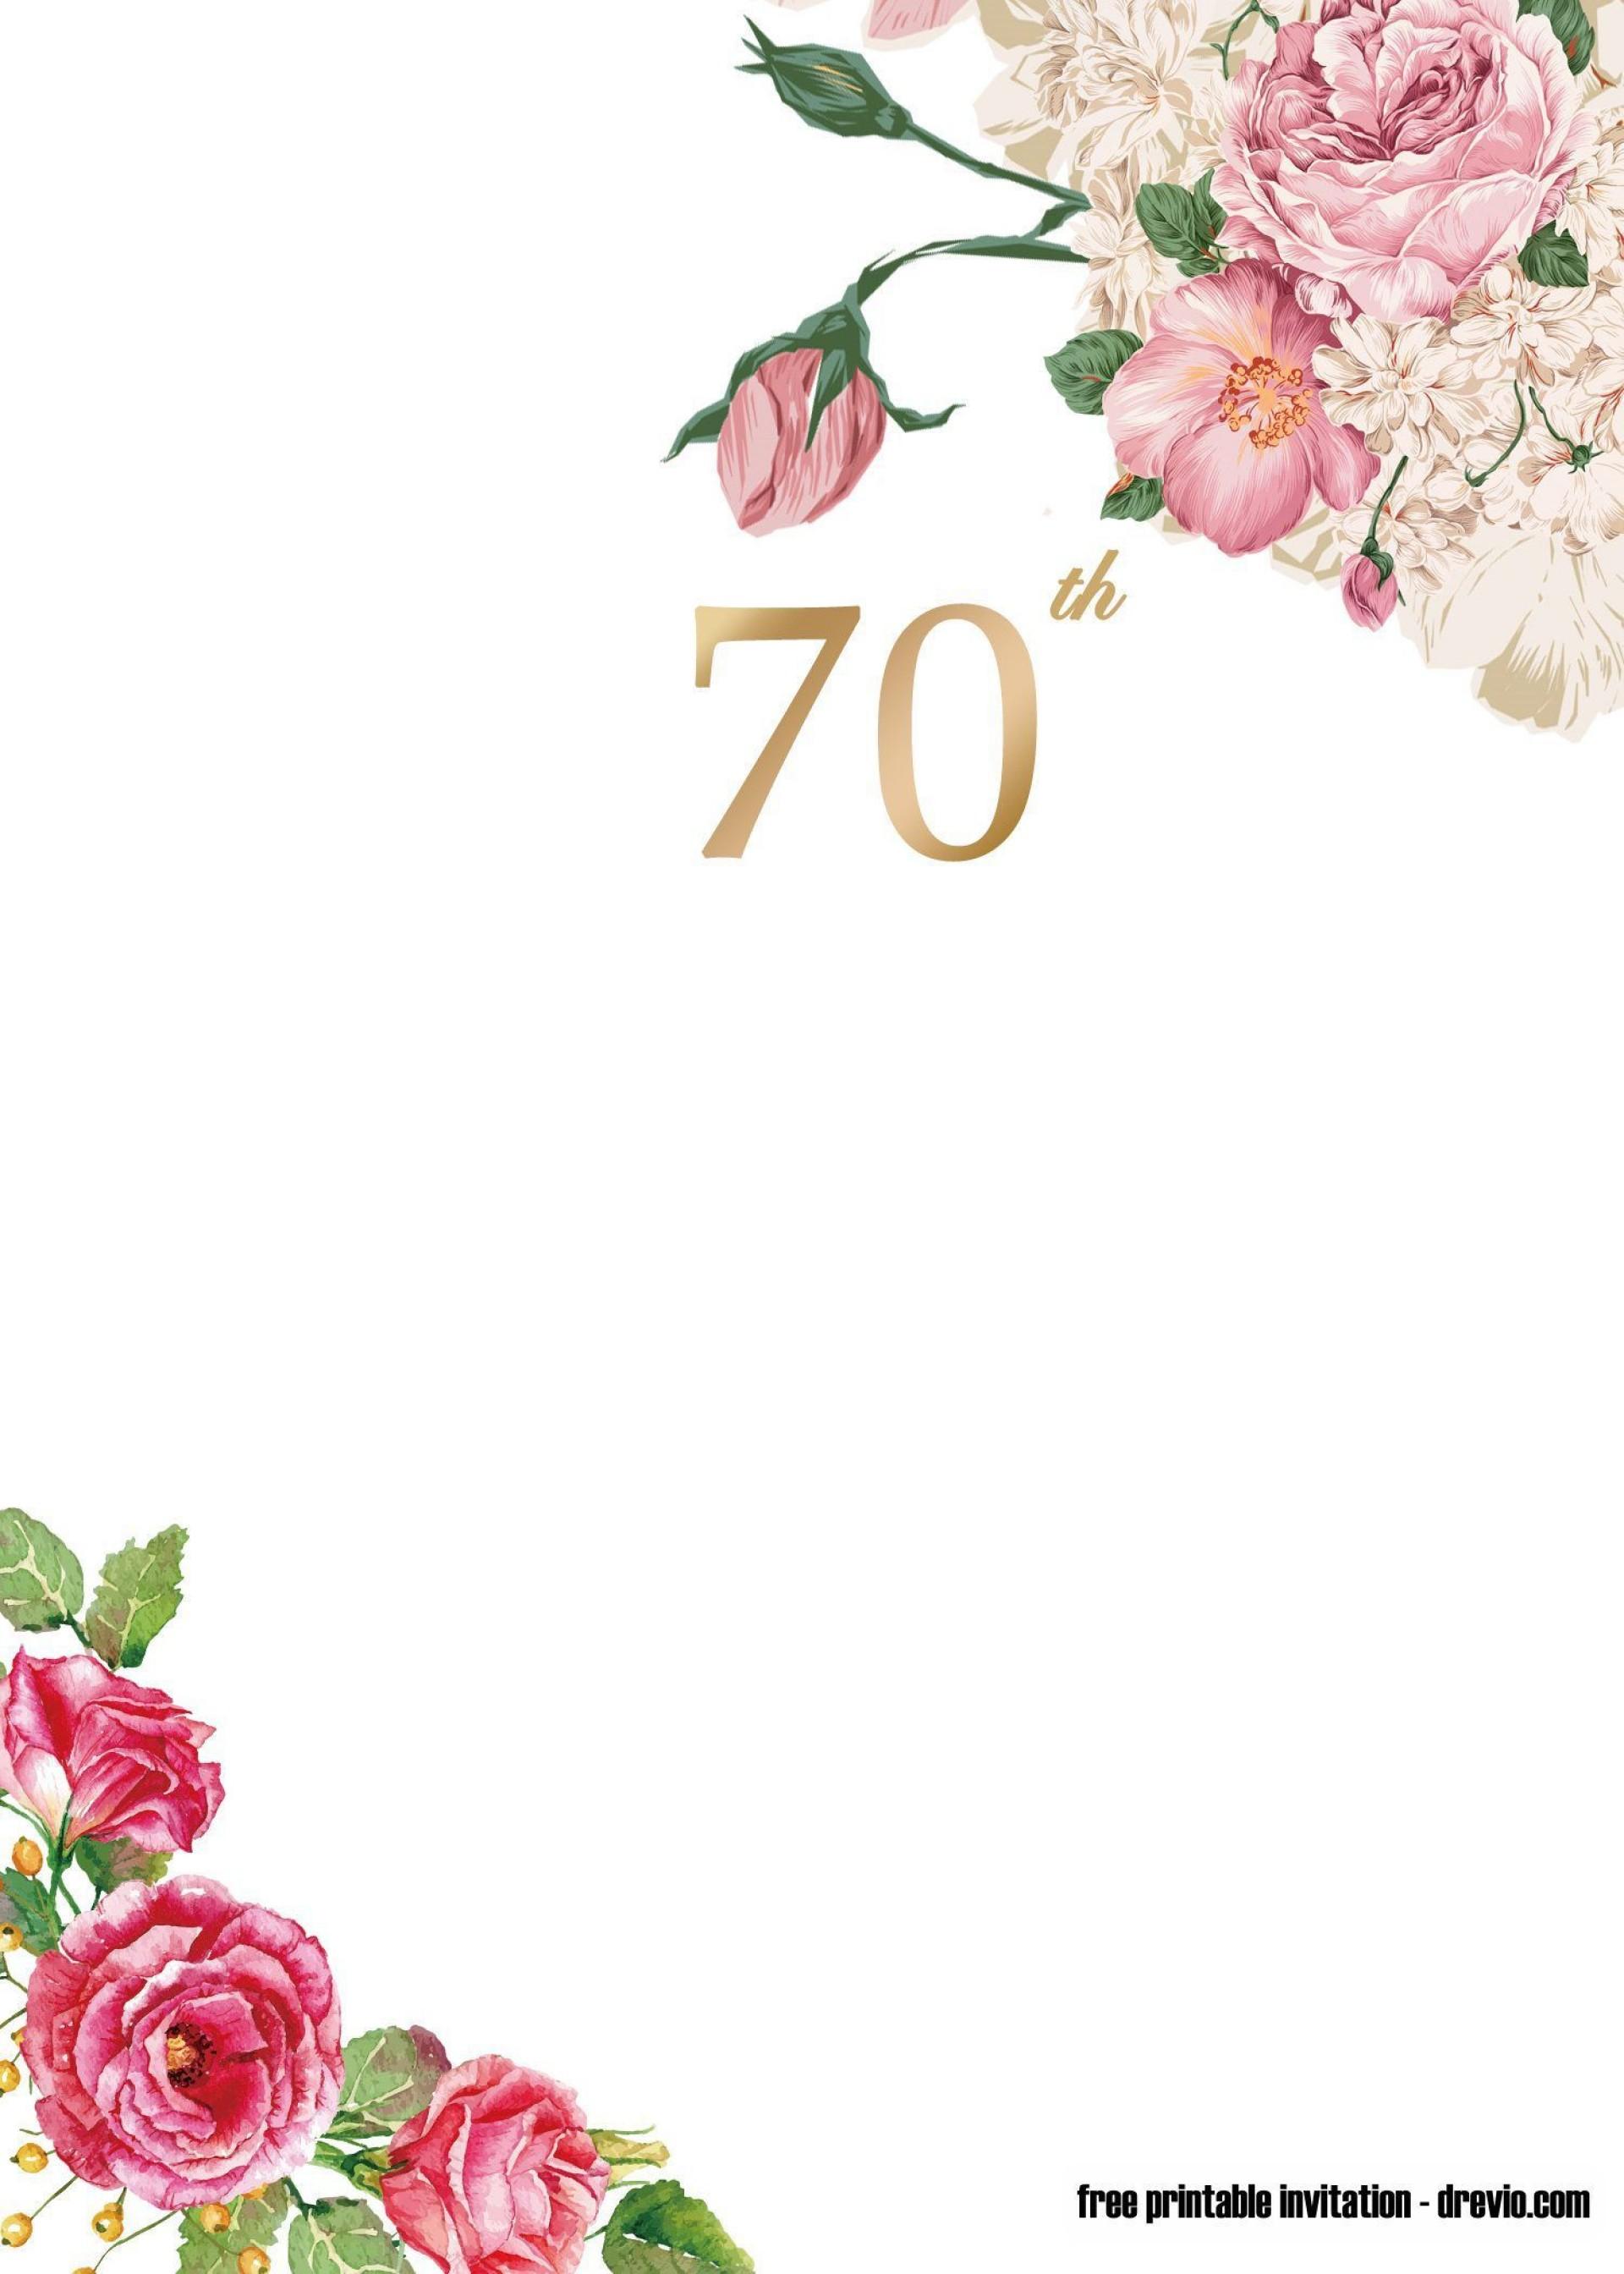 007 Wondrou 70th Birthday Invitation Template Free Highest Clarity  Surprise Invite With Photo1920